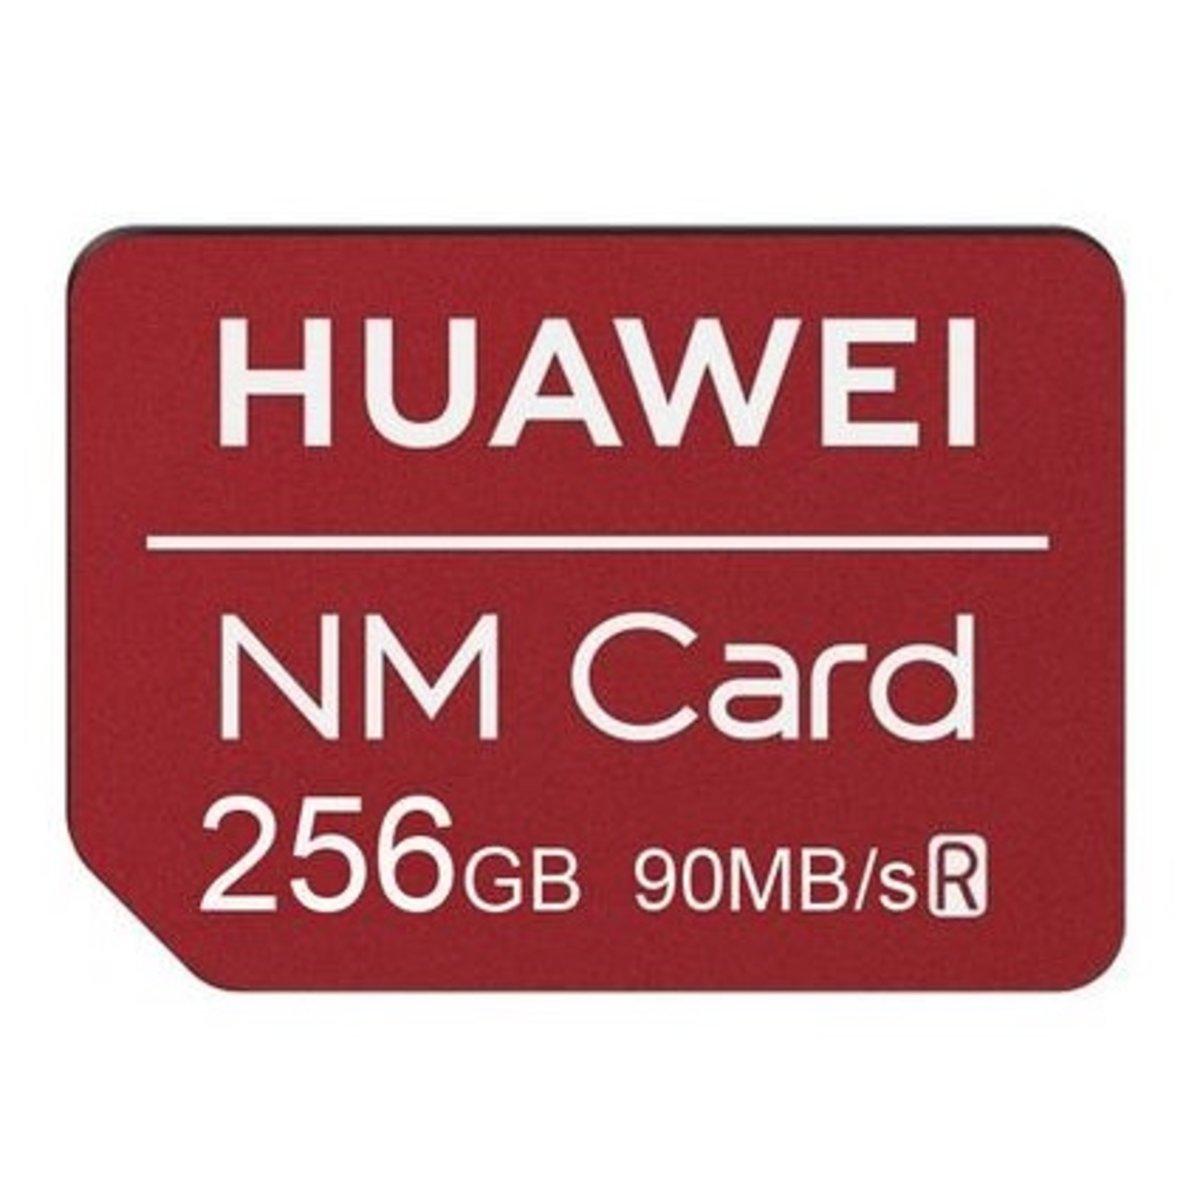 256GB NM (Nano Memory) Card Parallel import